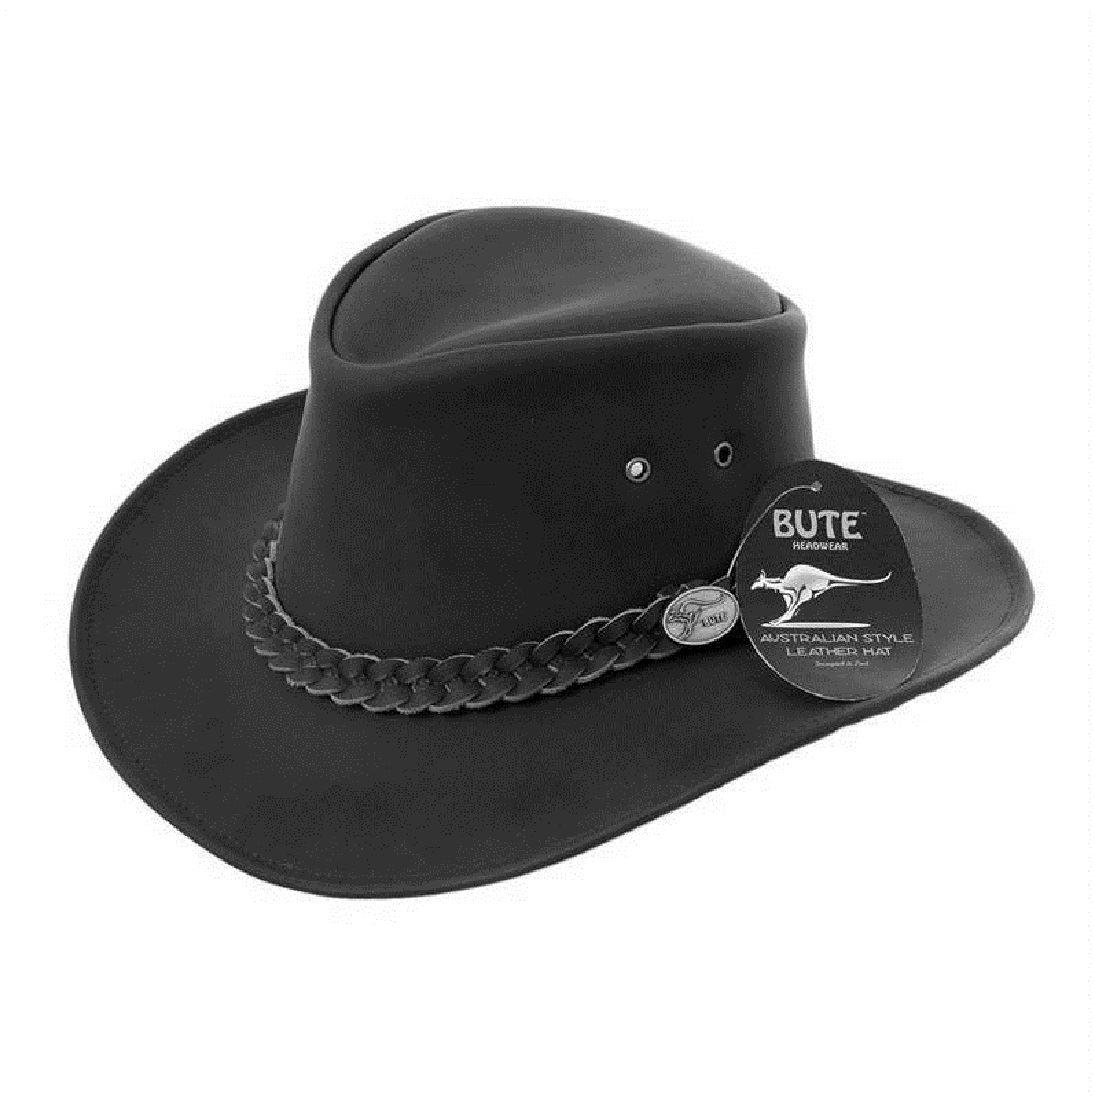 c2692b489170e Cuero Hombre Sombrero Vaquero Australiano Stetson en Caja